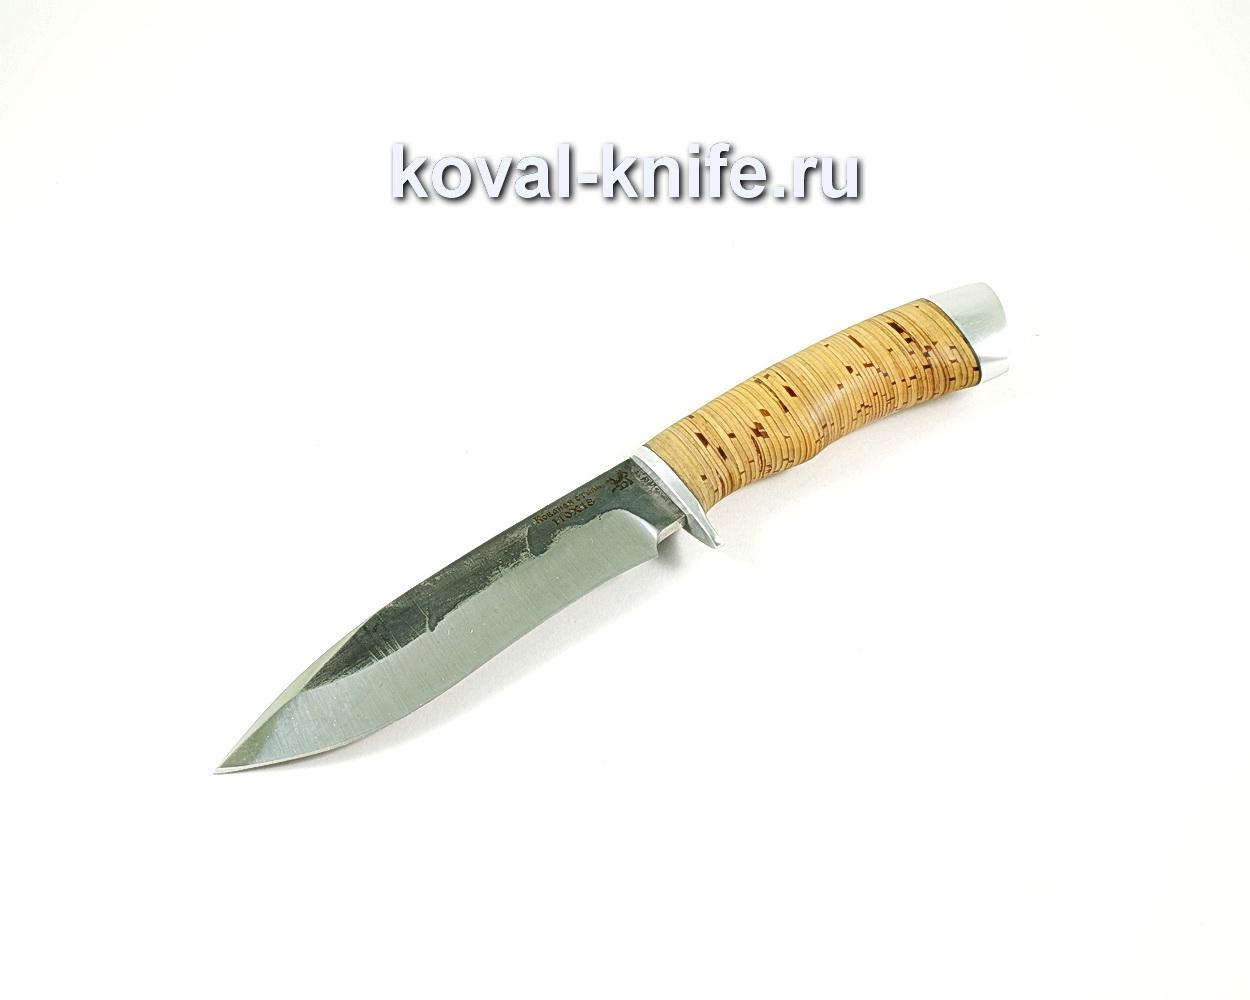 Нож Орлан (сталь 110х18), рукоять береста